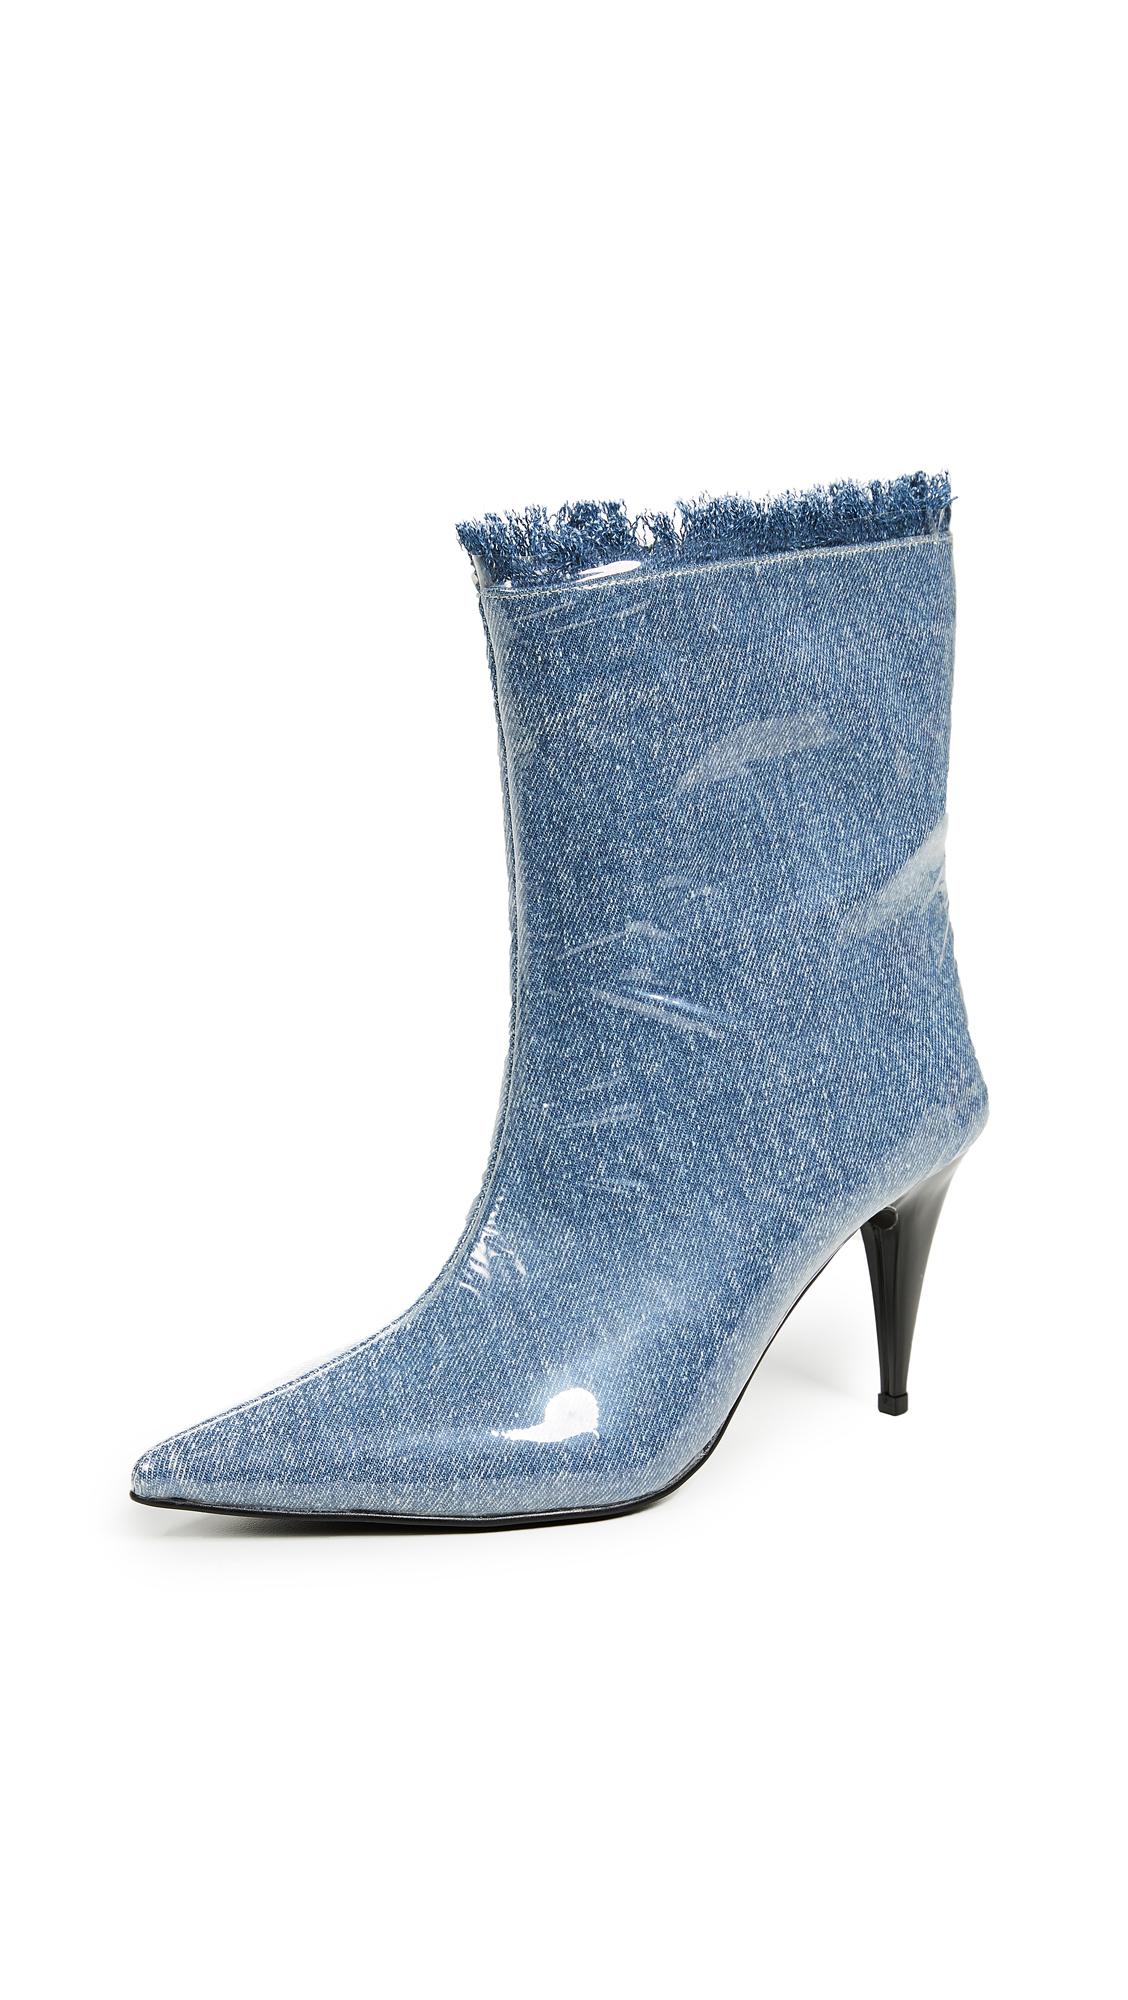 Jeffrey Campbell Plastique Point Toe Booties - Denim/Clear